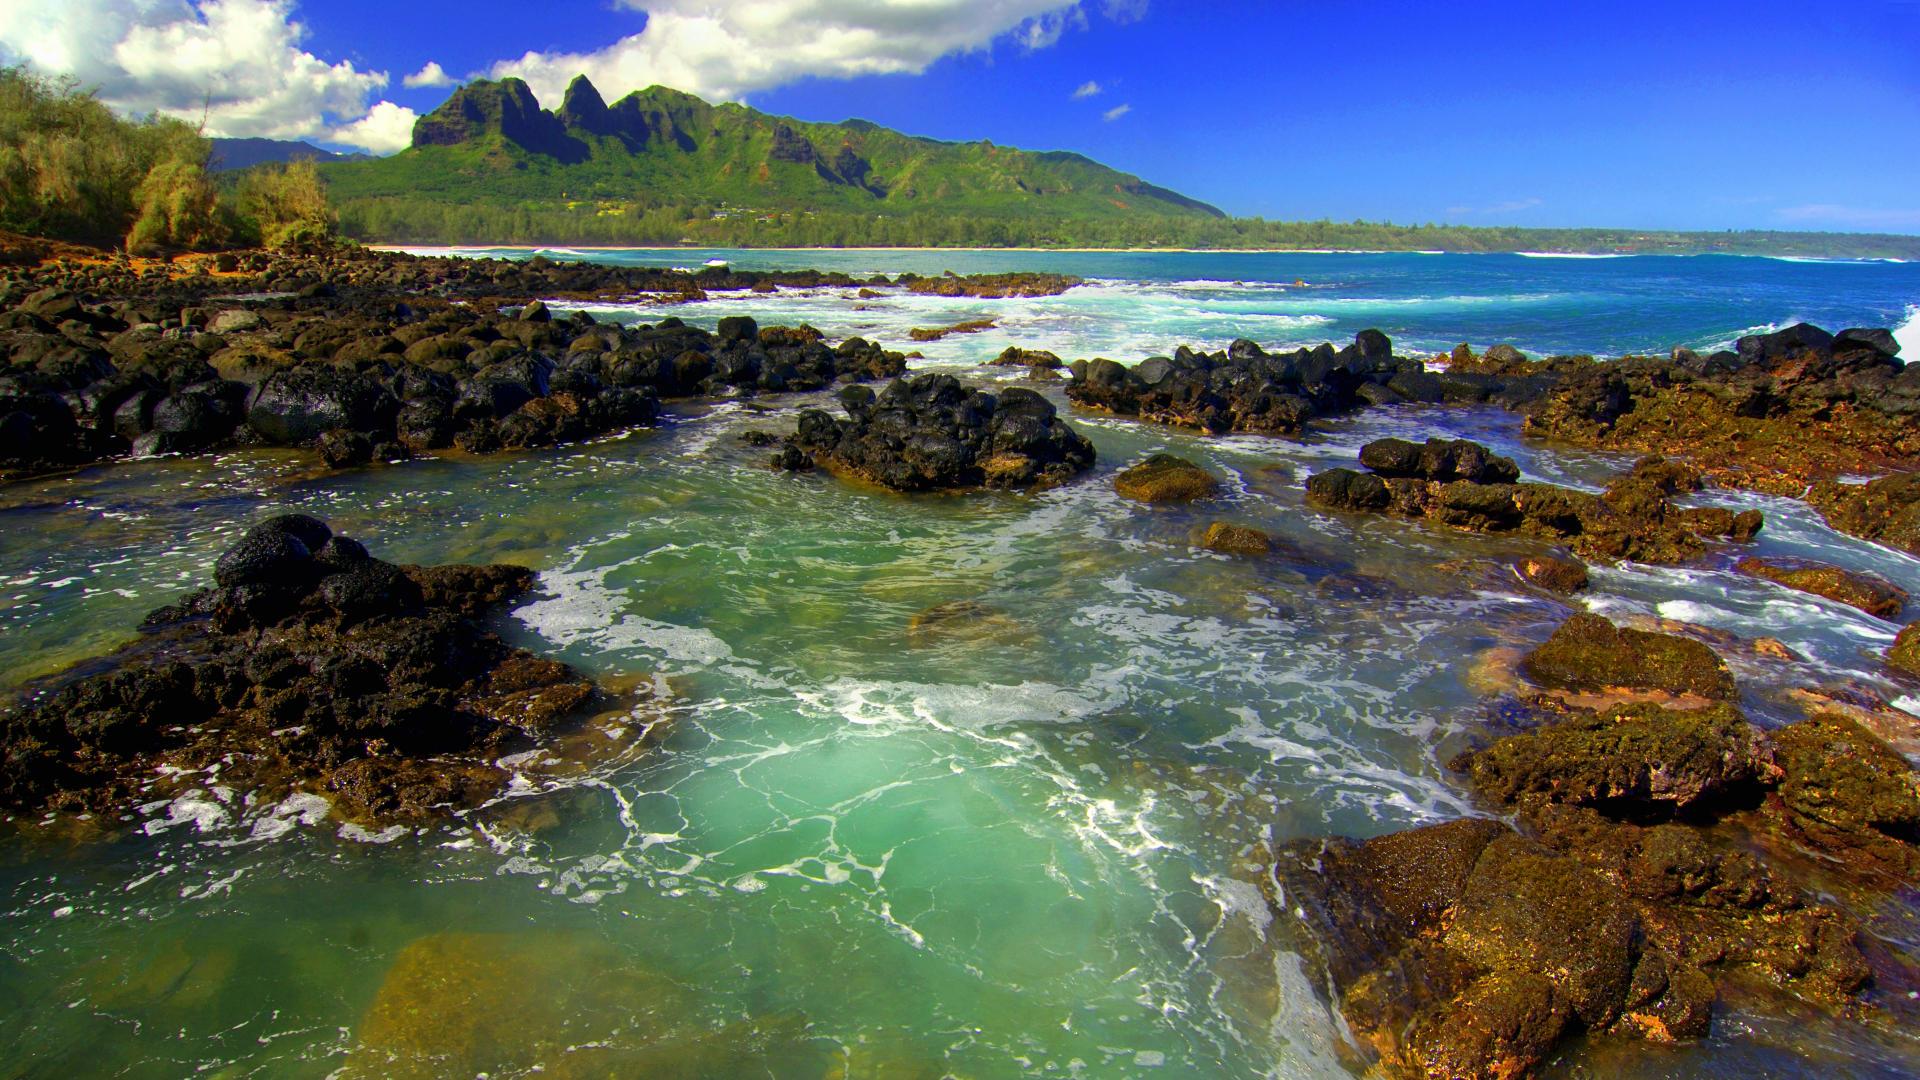 Background   Kong Mountain Seascape Kauai   Cool Backgrounds 1920x1080